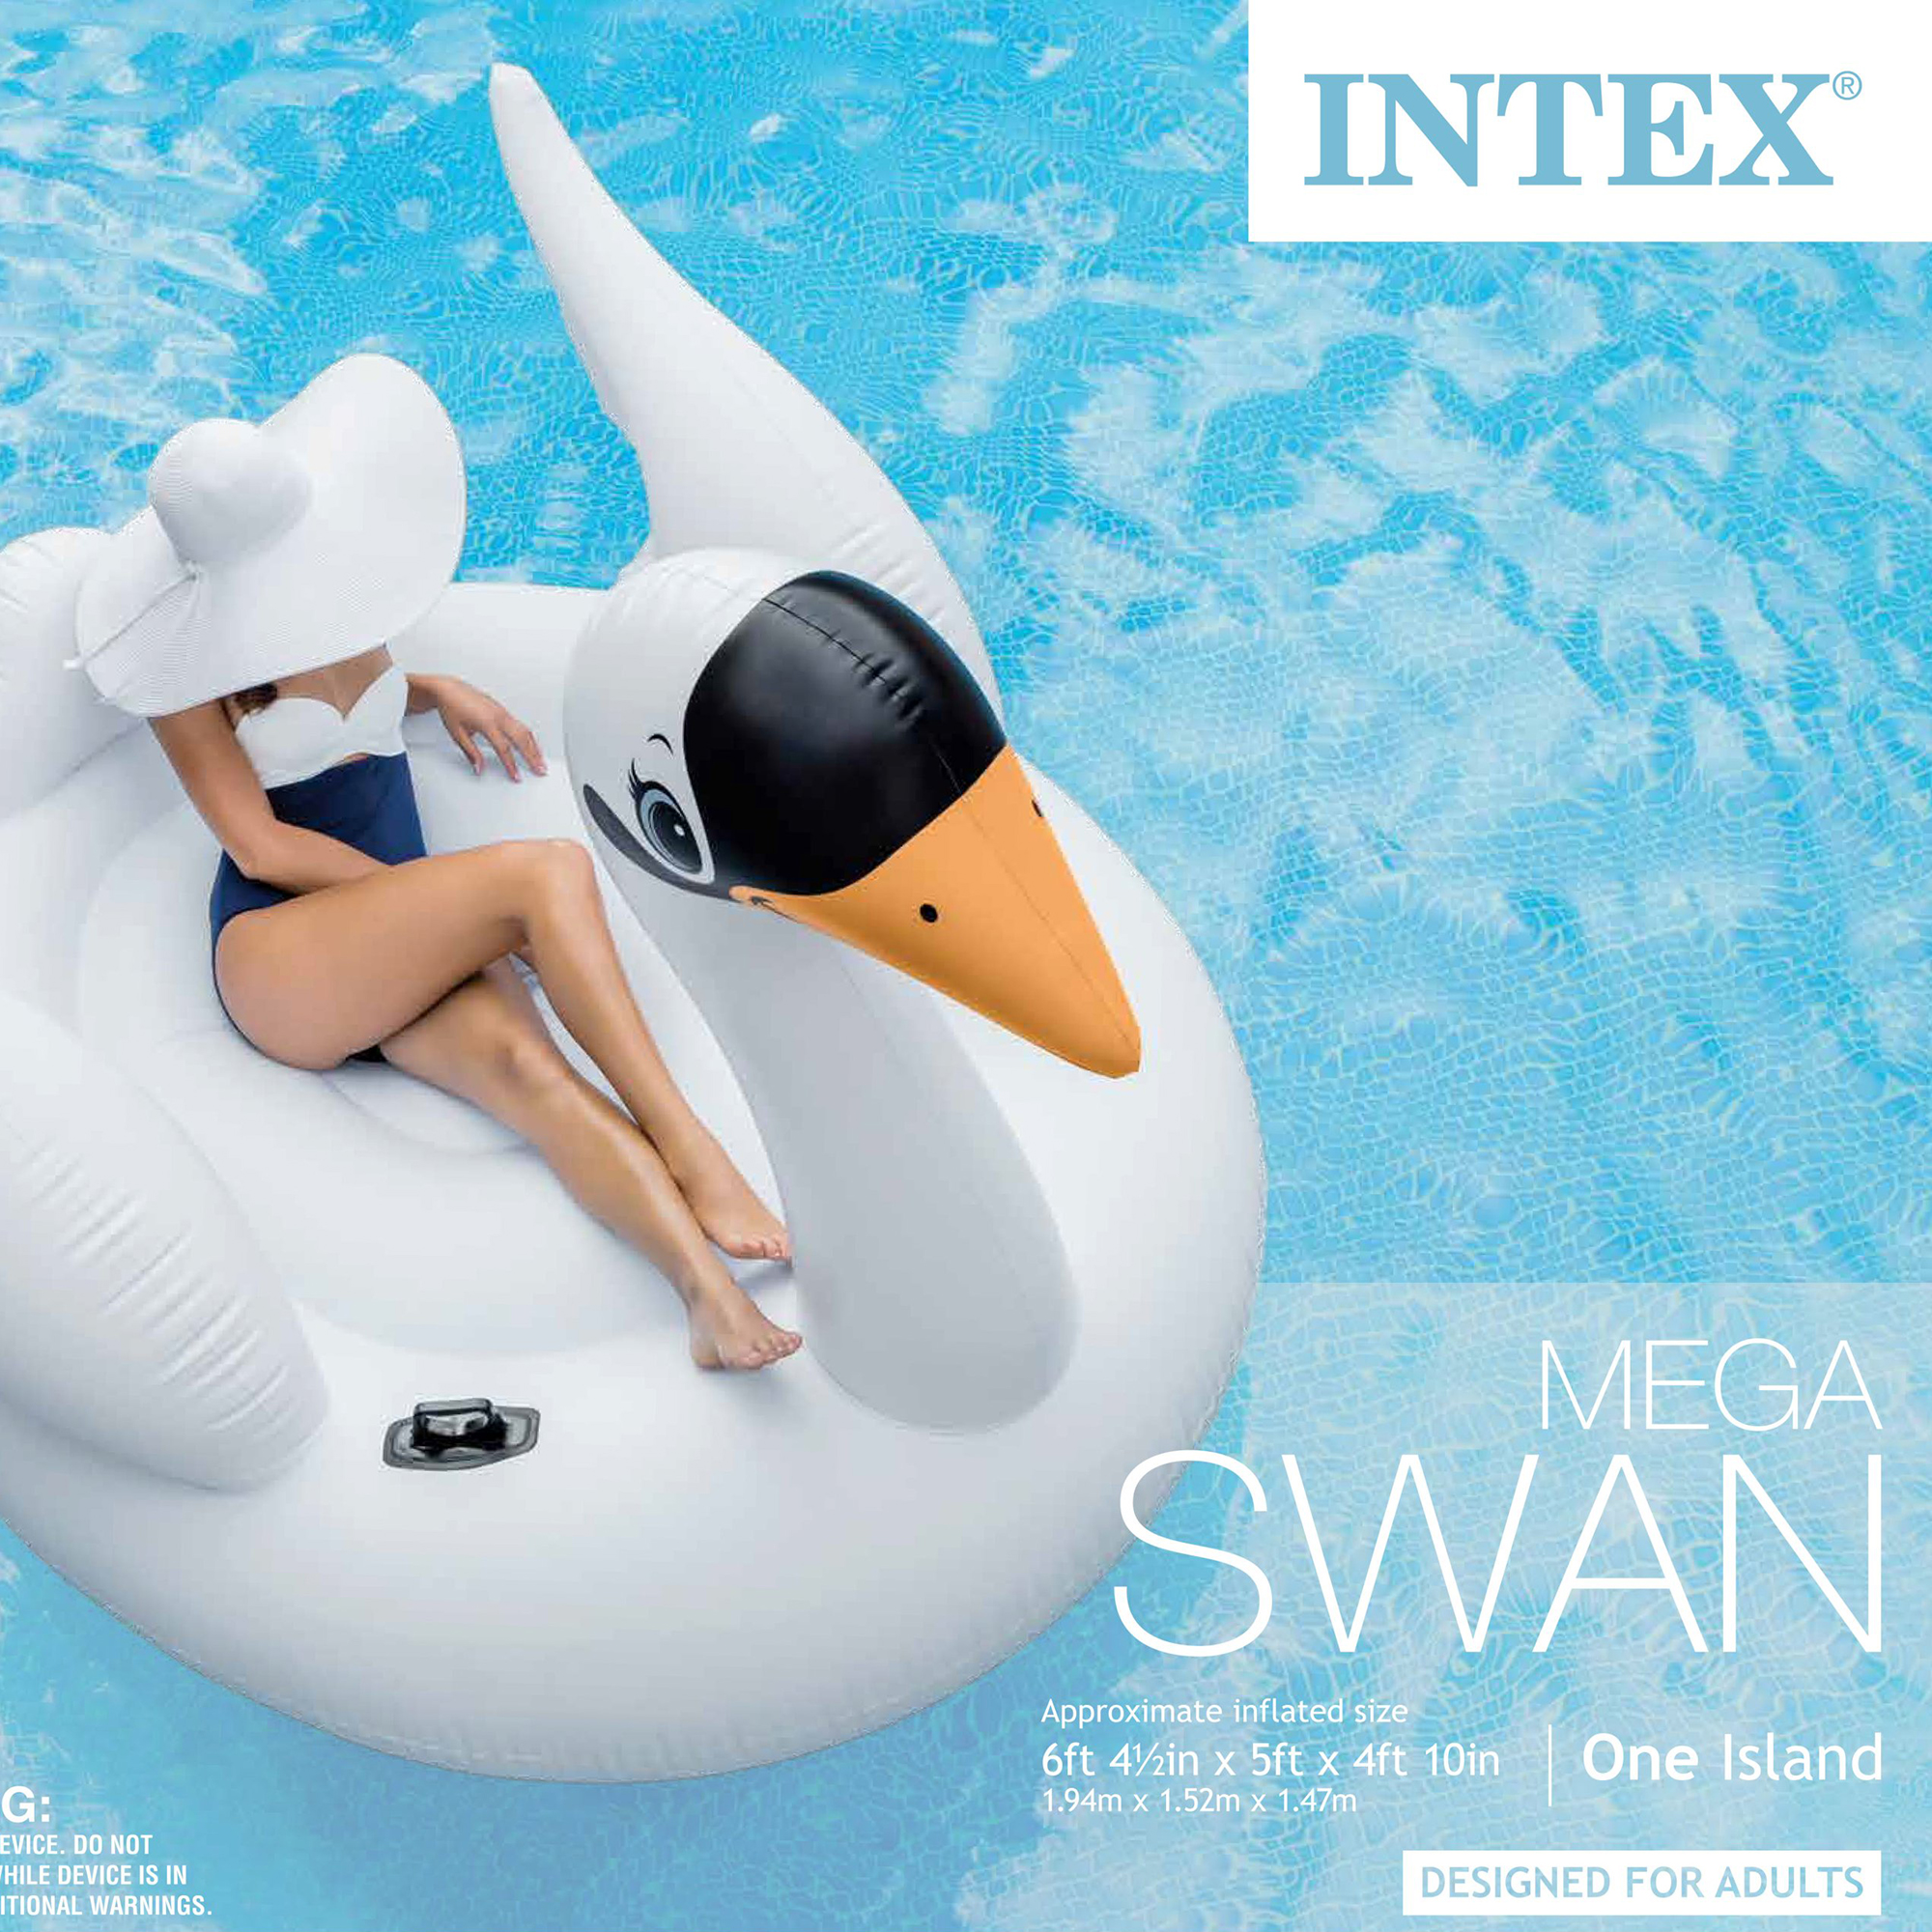 Intex Mega Swan and Pink Flamingo Island Inflatable Swimming Pool